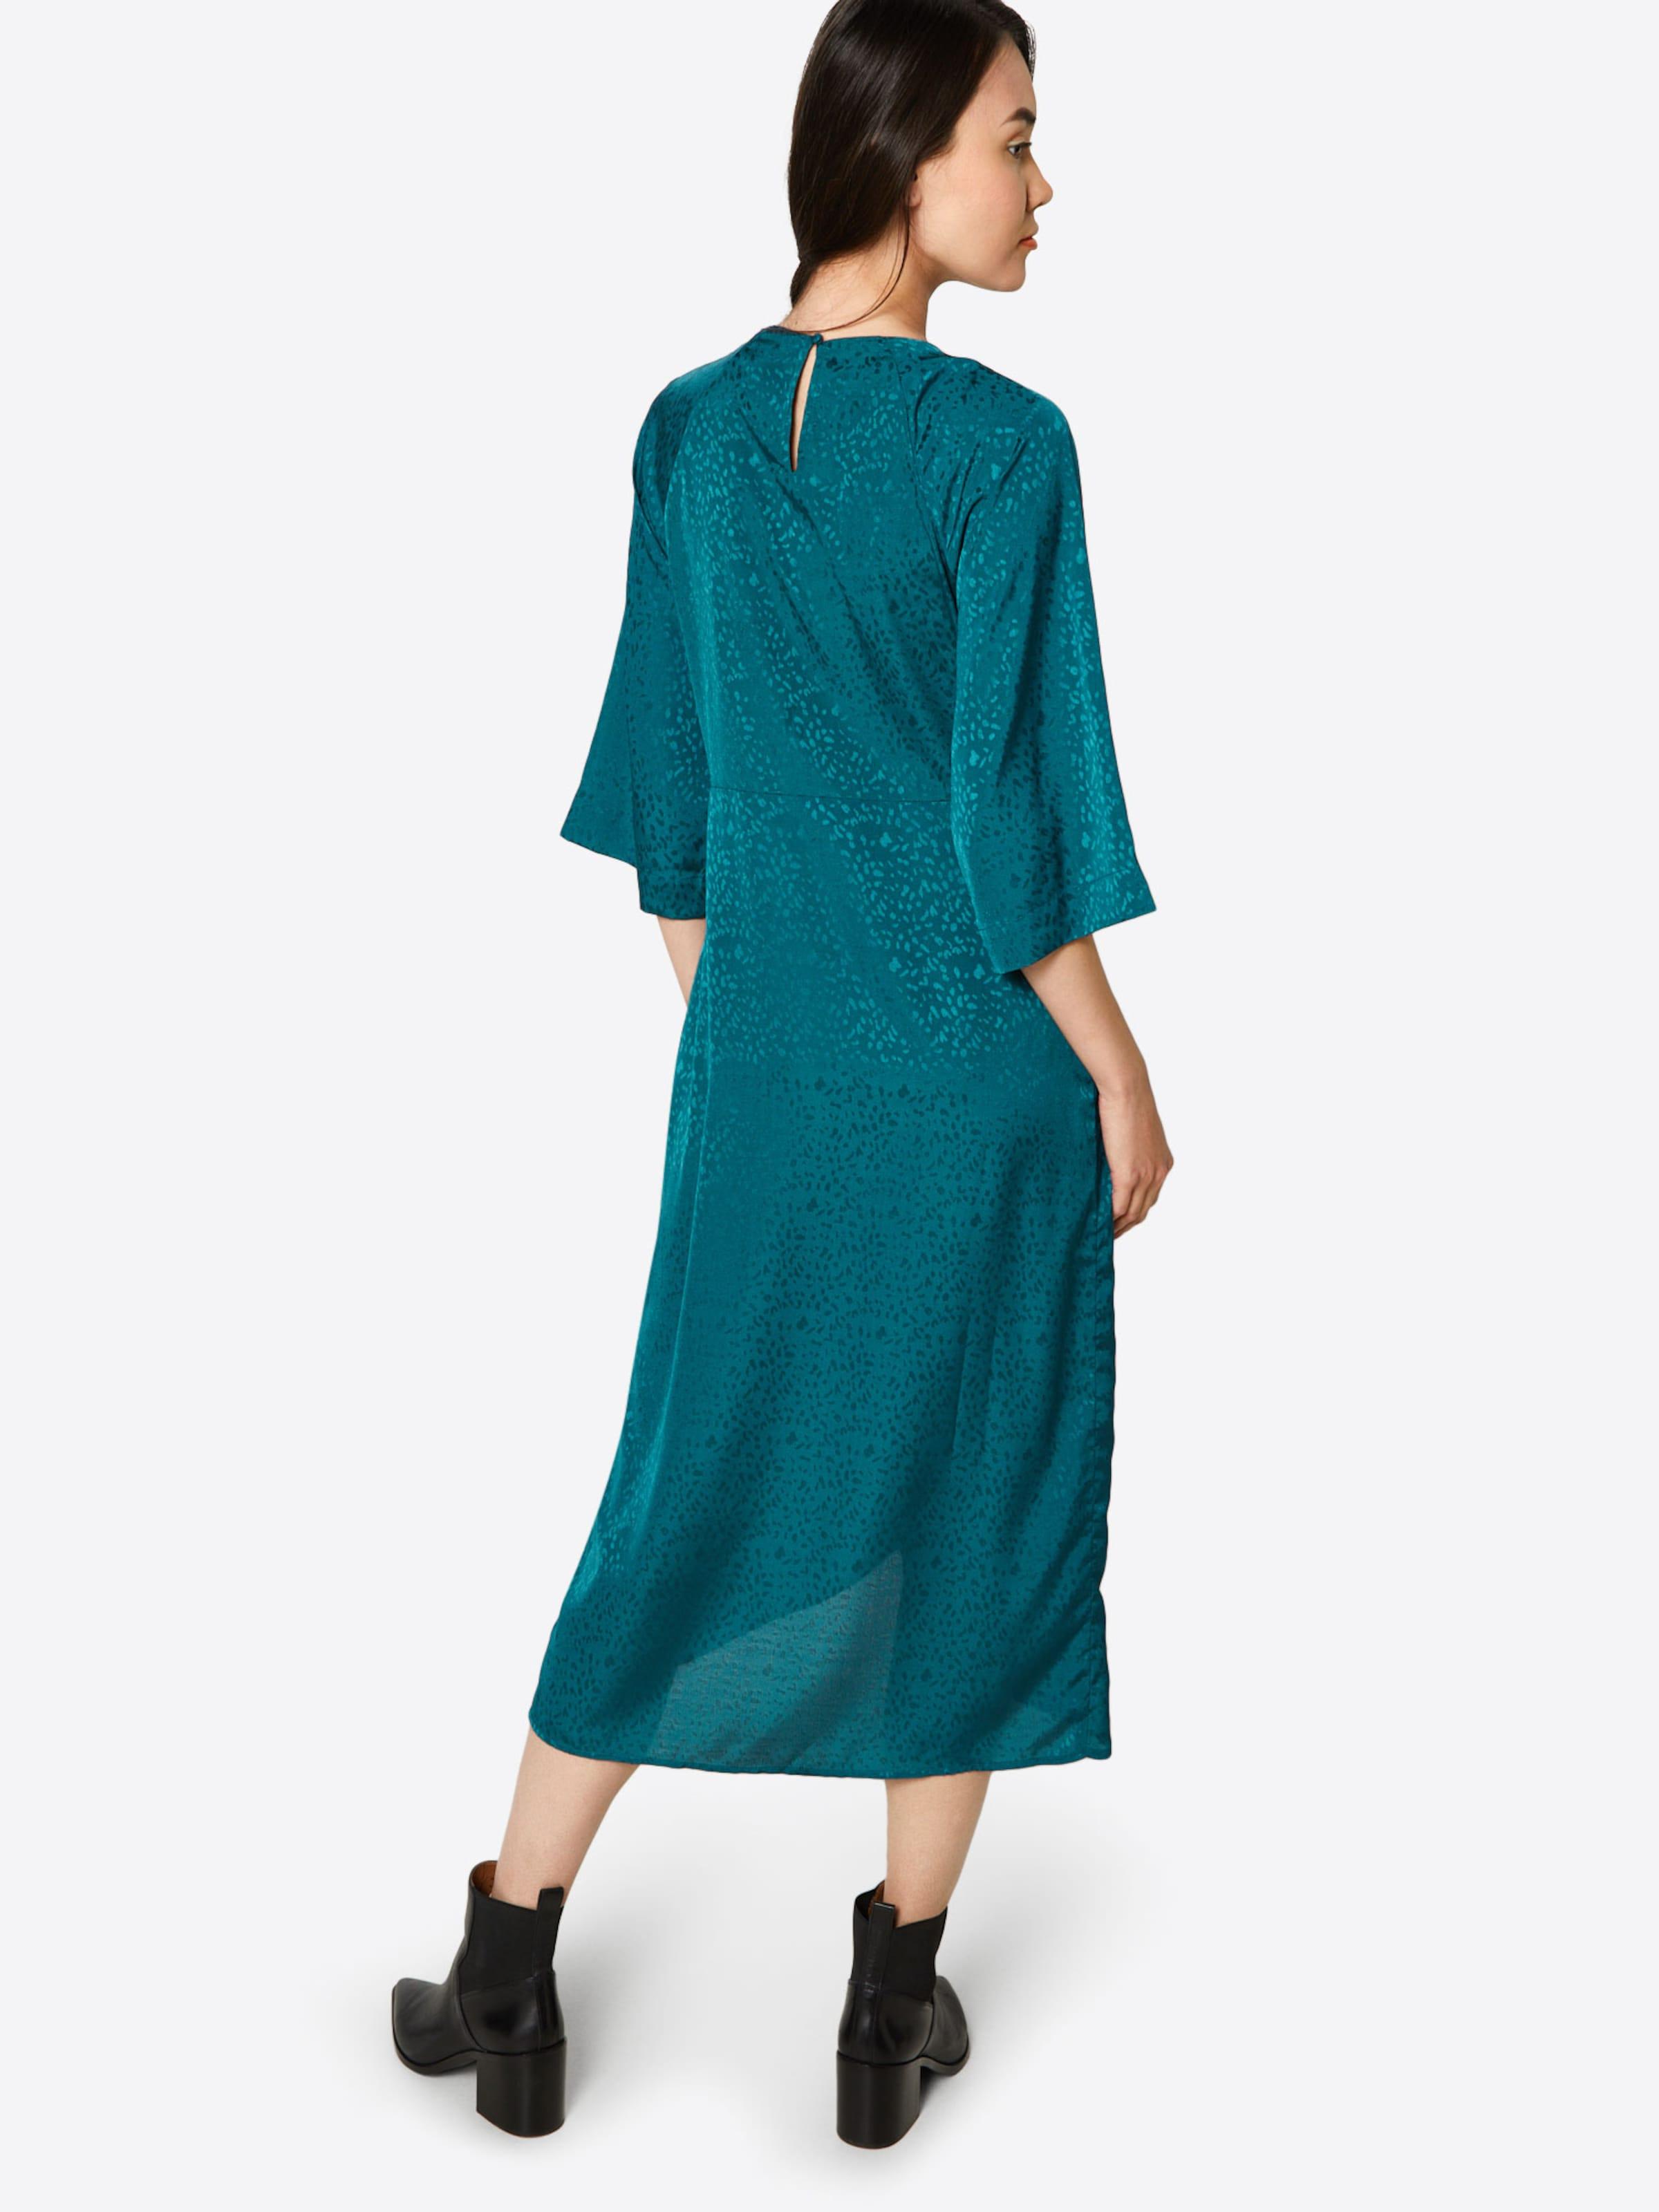 4 3 Smaragd Vila Kleid 'viliva Sleeve' In rxWCeBod